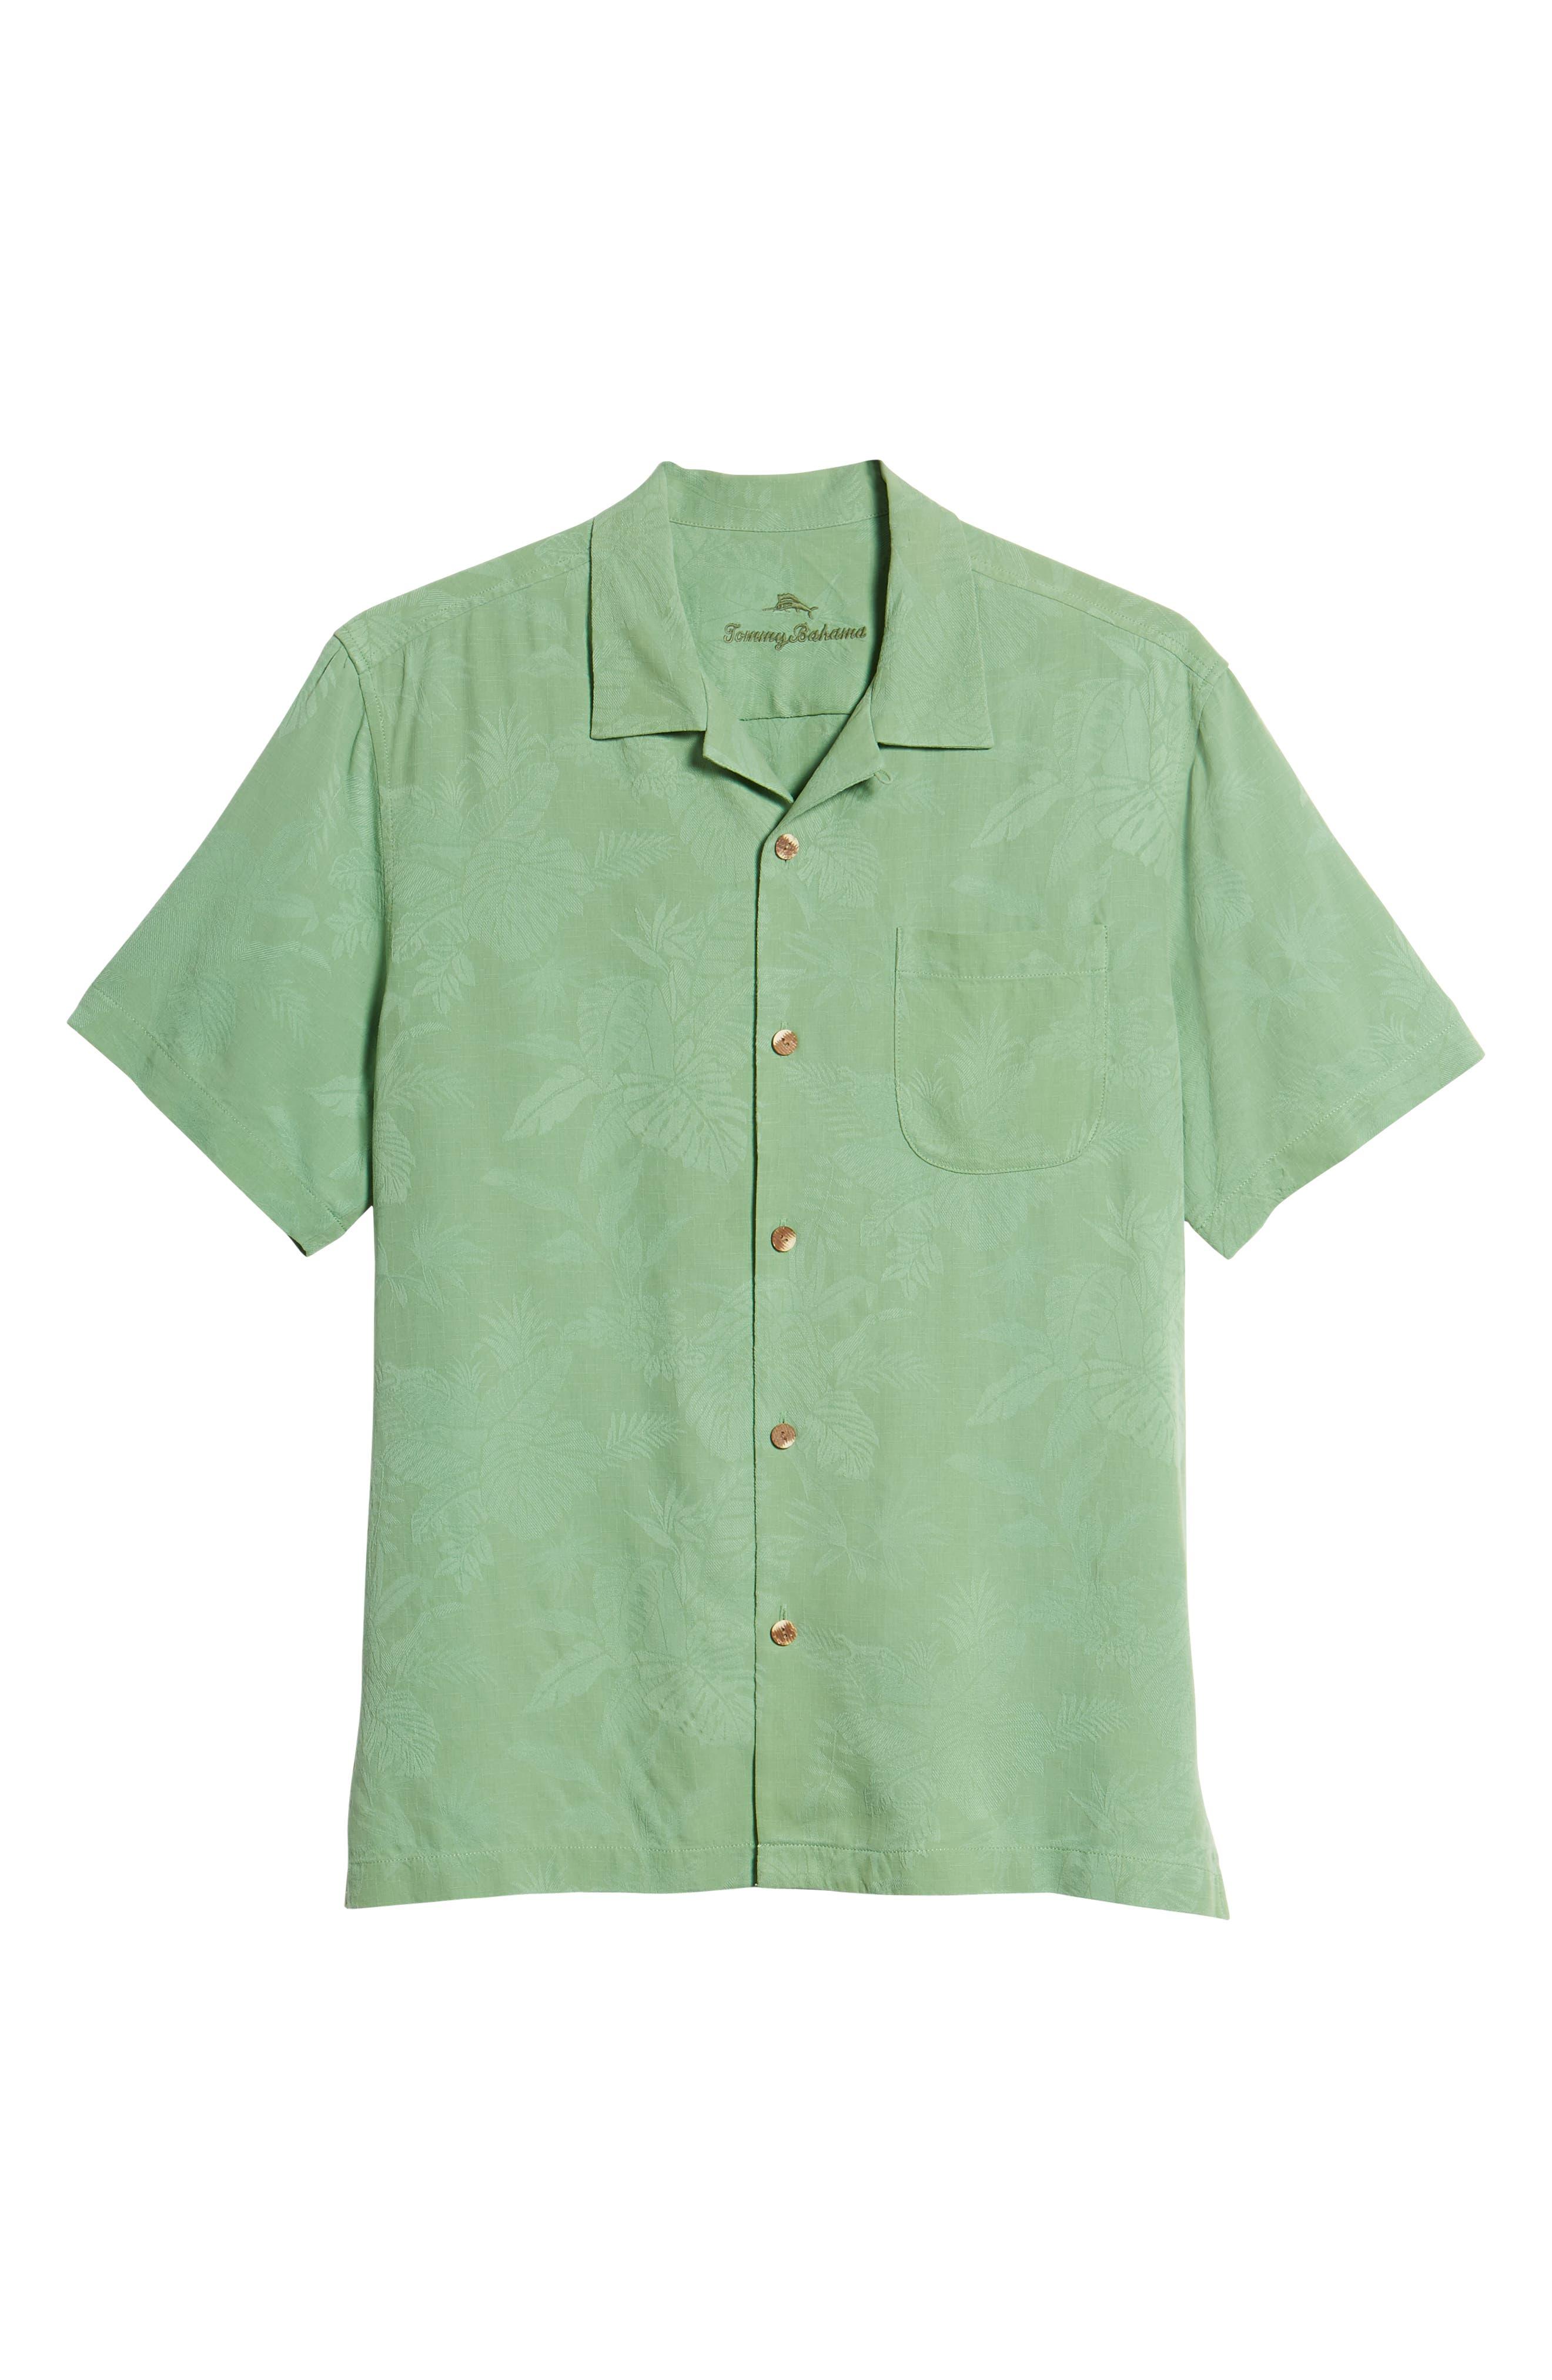 La Grande Gingham Linen Sport Shirt,                             Alternate thumbnail 6, color,                             COBALT SEA